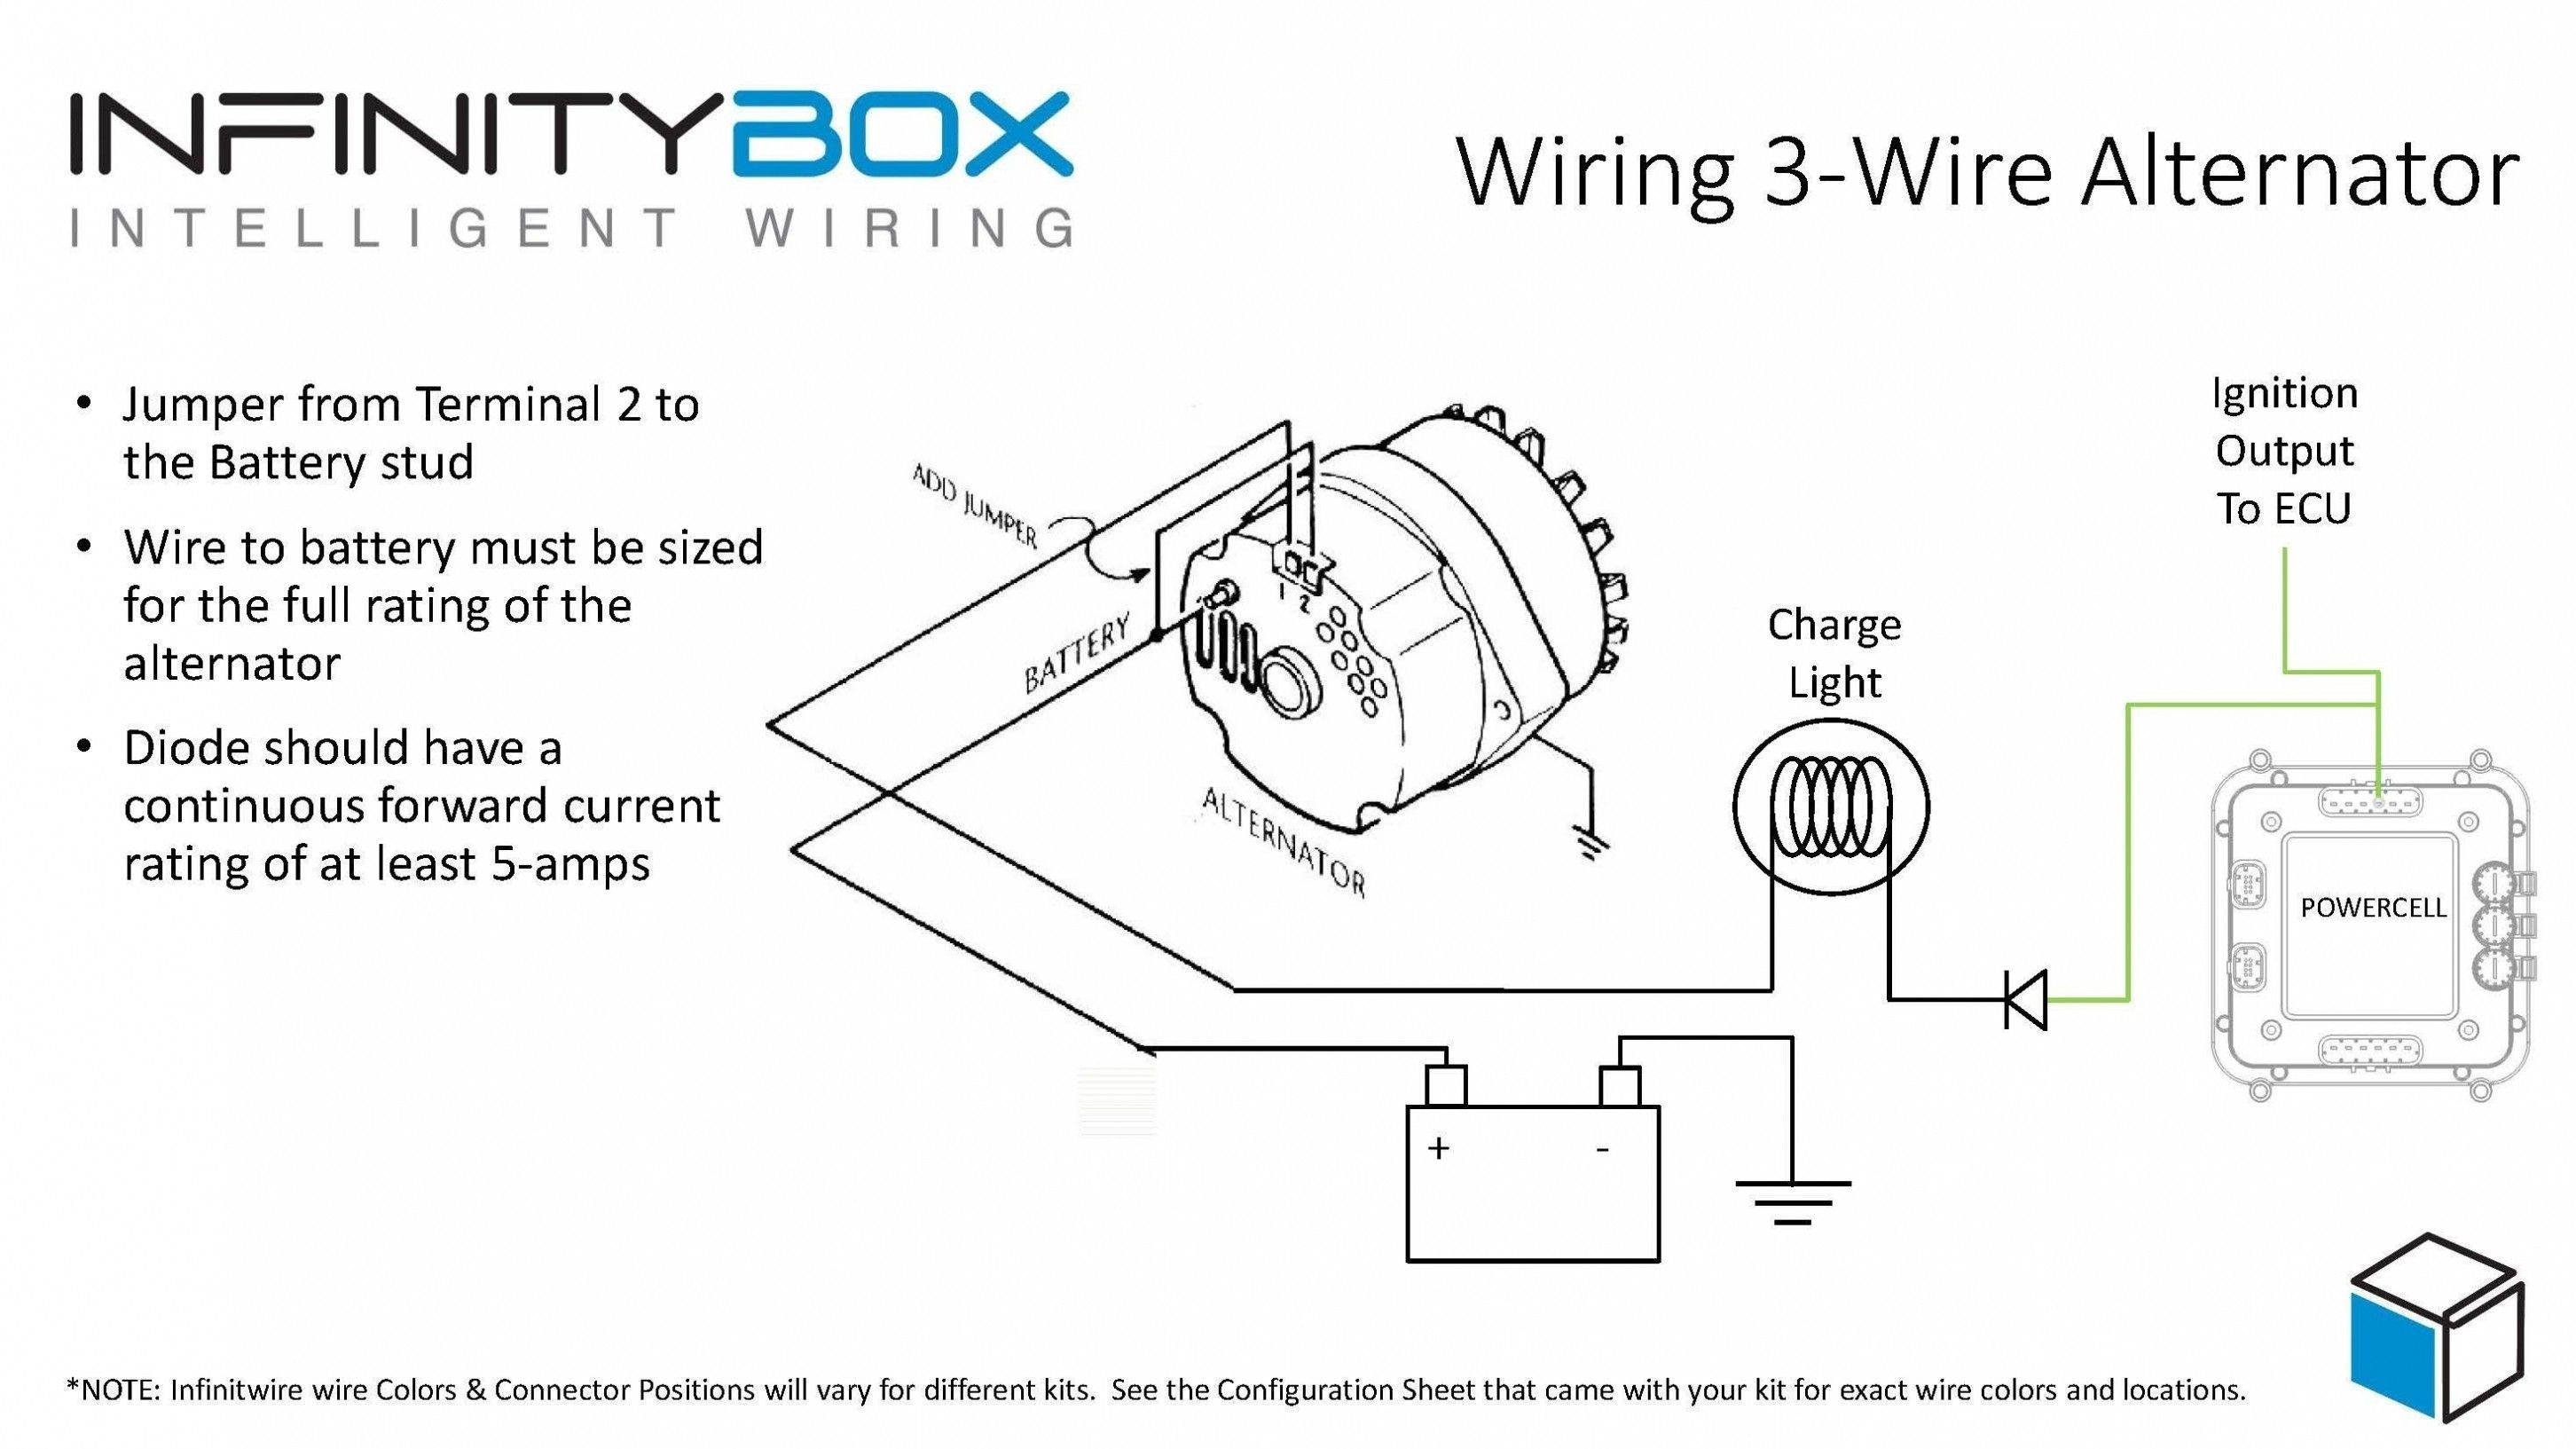 Best Of E46 Alternator Wiring Diagram Diagrams Digramssample Diagramimages Wiringdiagramsample Wiringdiagram Car Alternator Alternator Diagram